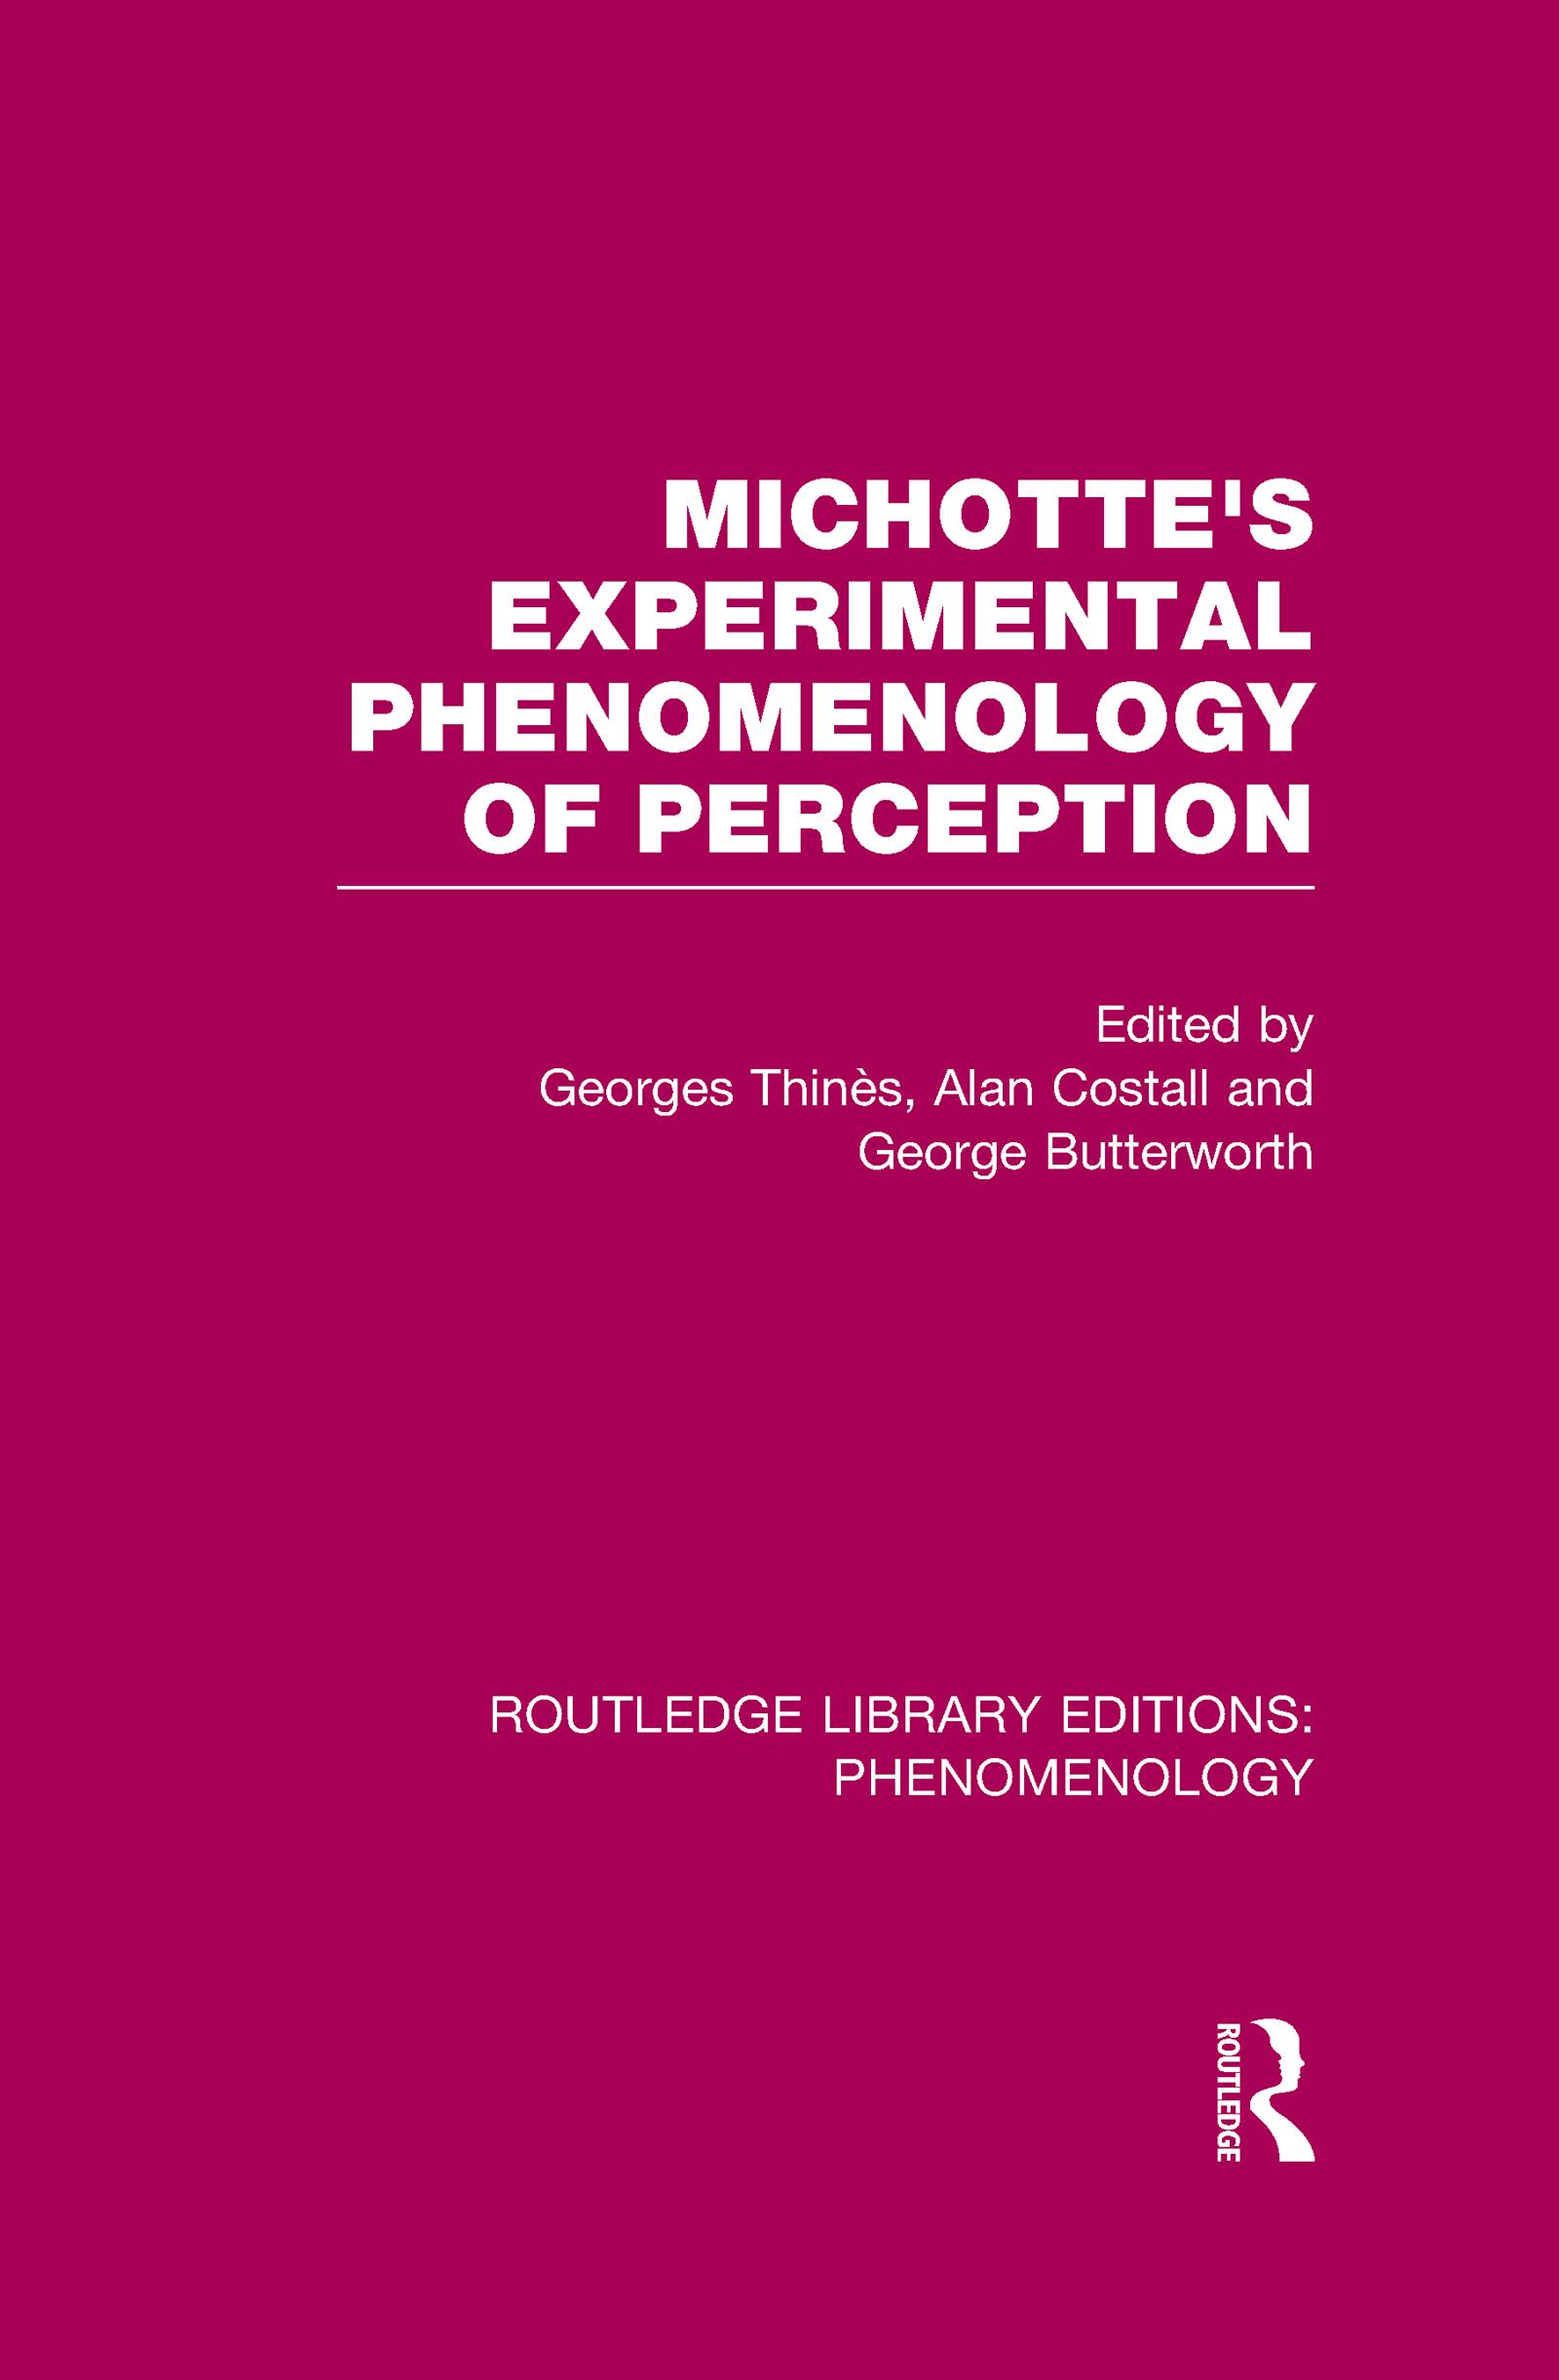 Michotte's Experimental Phenomenology of Perception